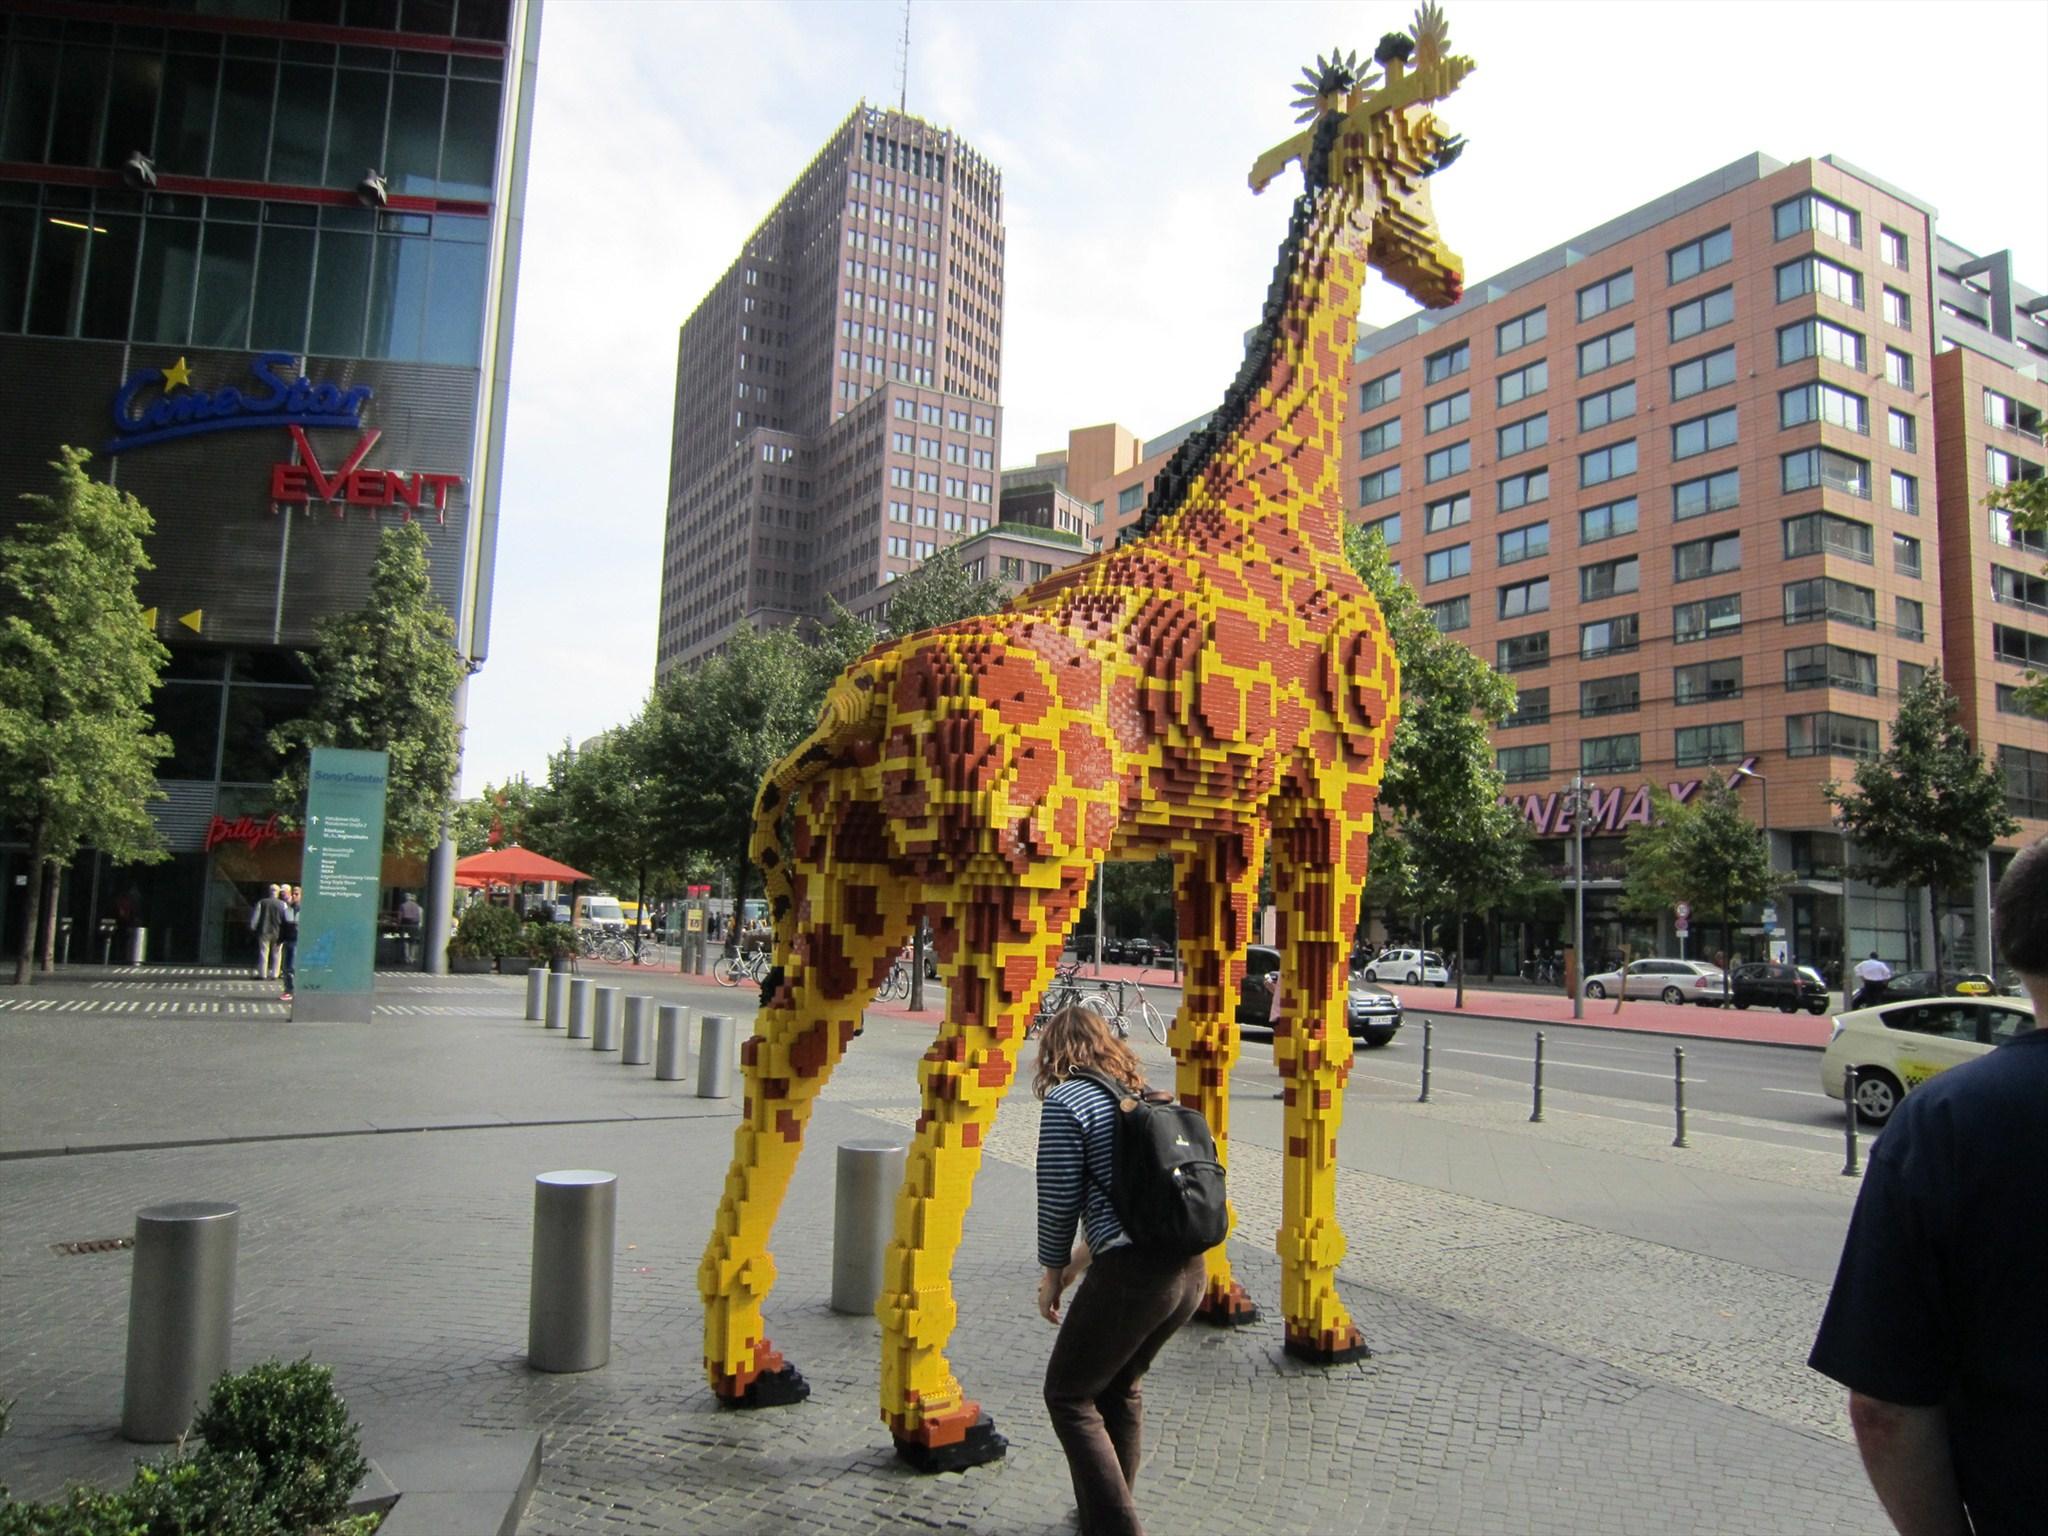 lego giraffe legoland discovery center berlin d image. Black Bedroom Furniture Sets. Home Design Ideas